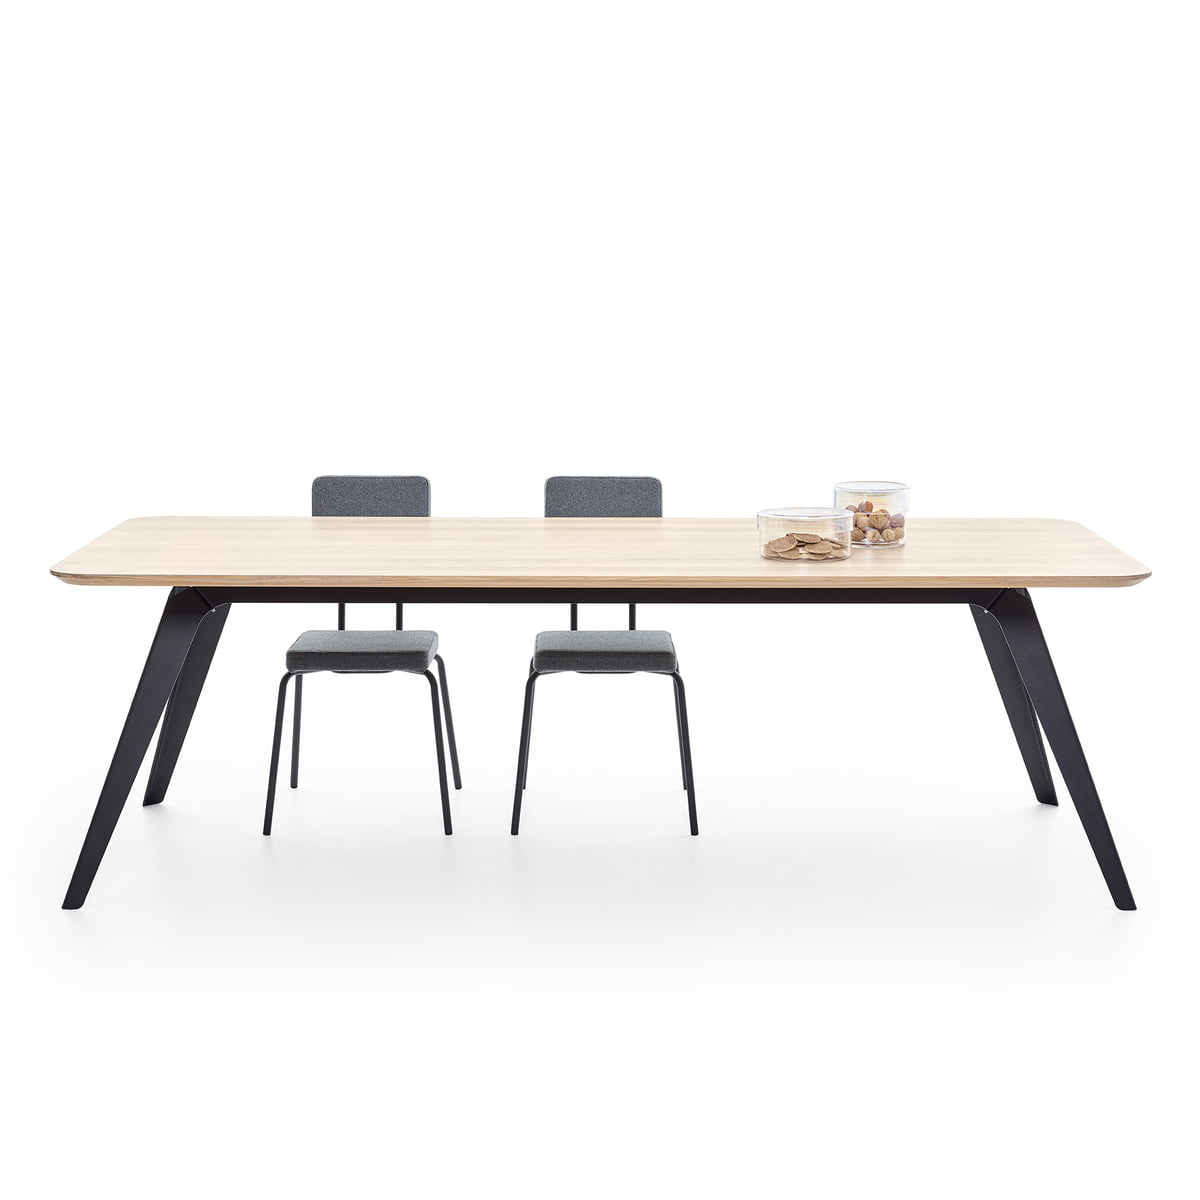 Puik Fold spisebord 200 × 95 cm, eg sort